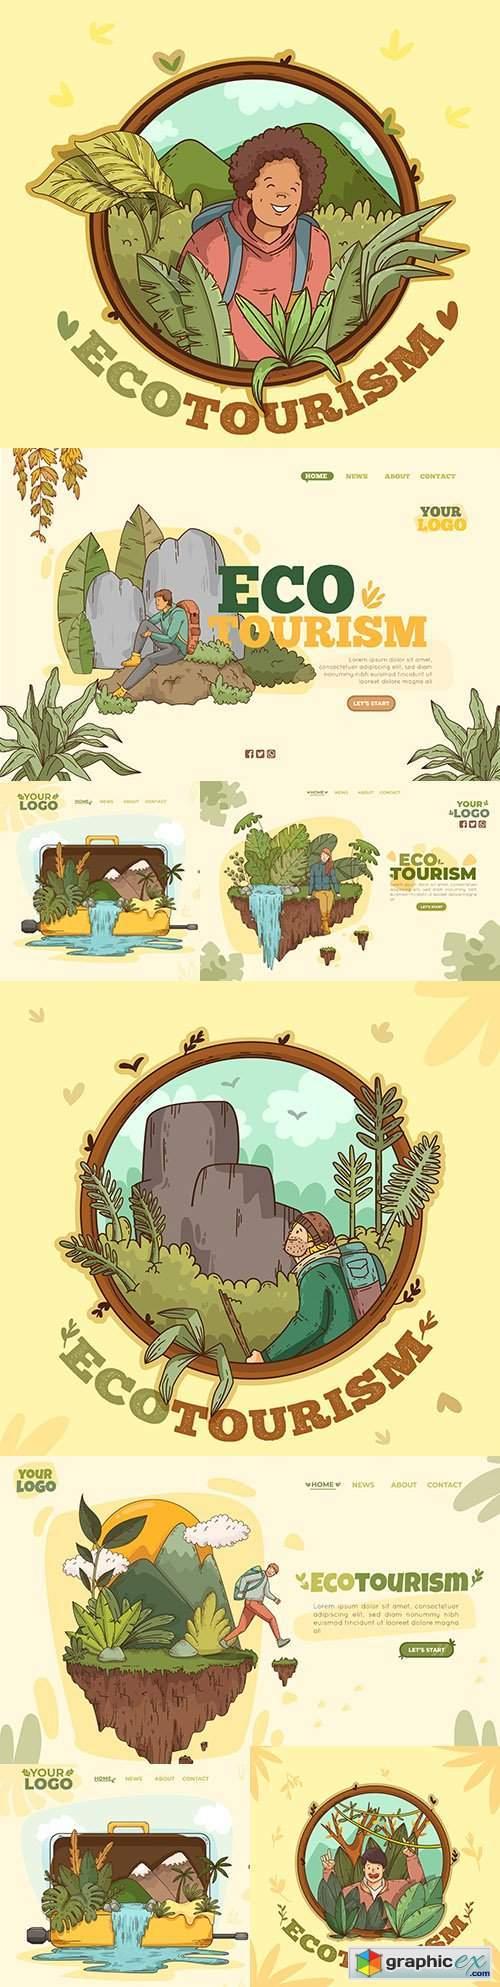 Eco tourism template landing page design